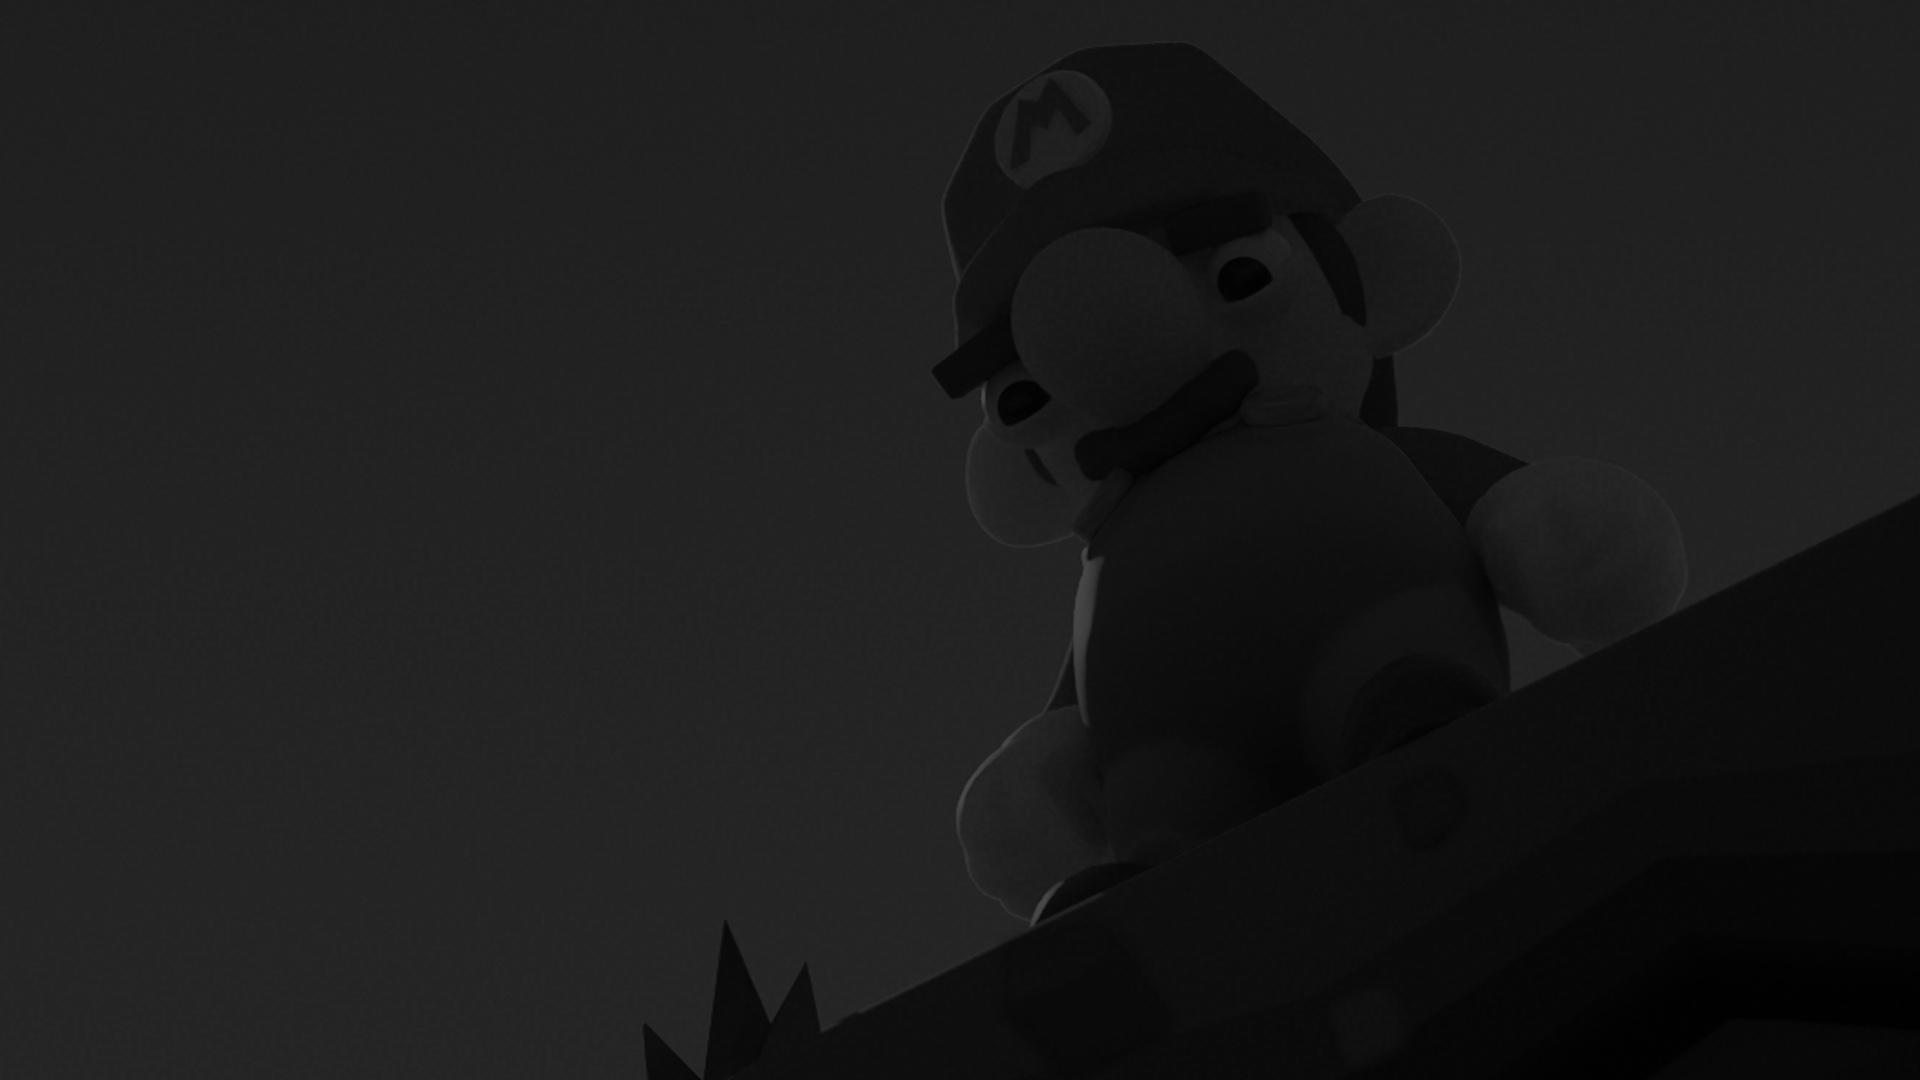 mario banner black and white